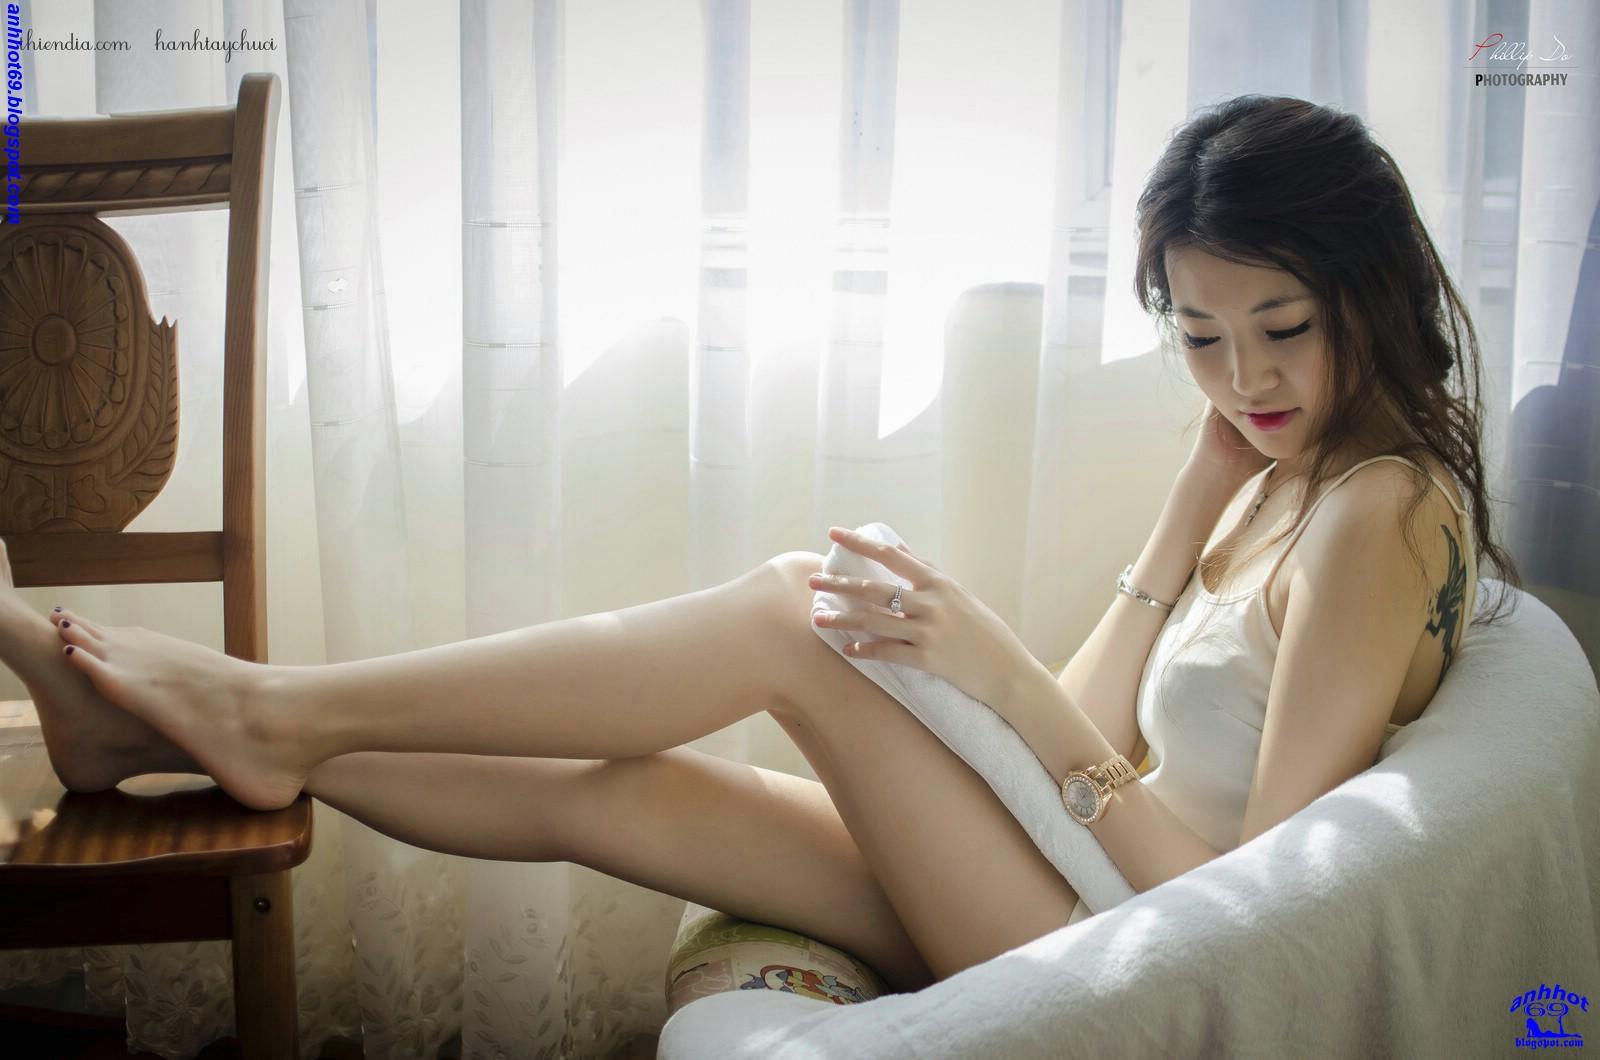 en kvinne suger gai Vietnam